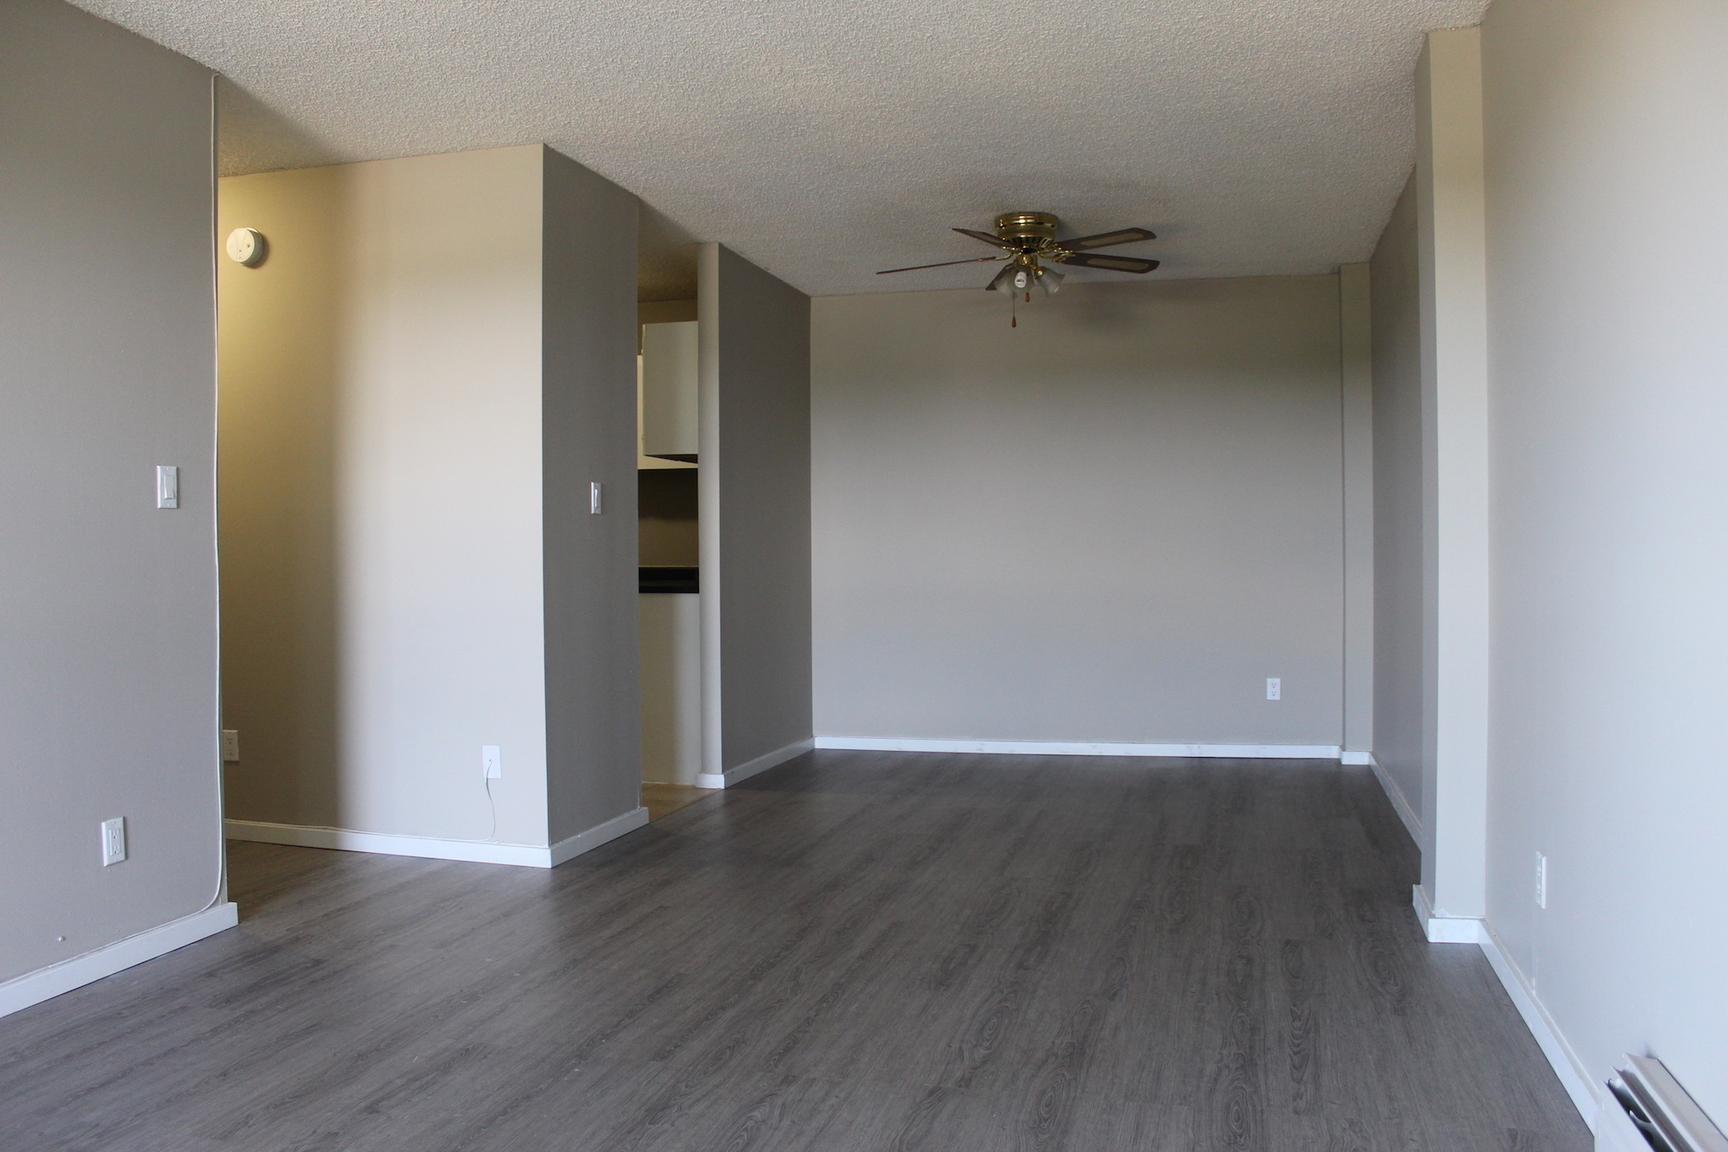 205 Heritage Drive SE, Calgary, AB - $1,125